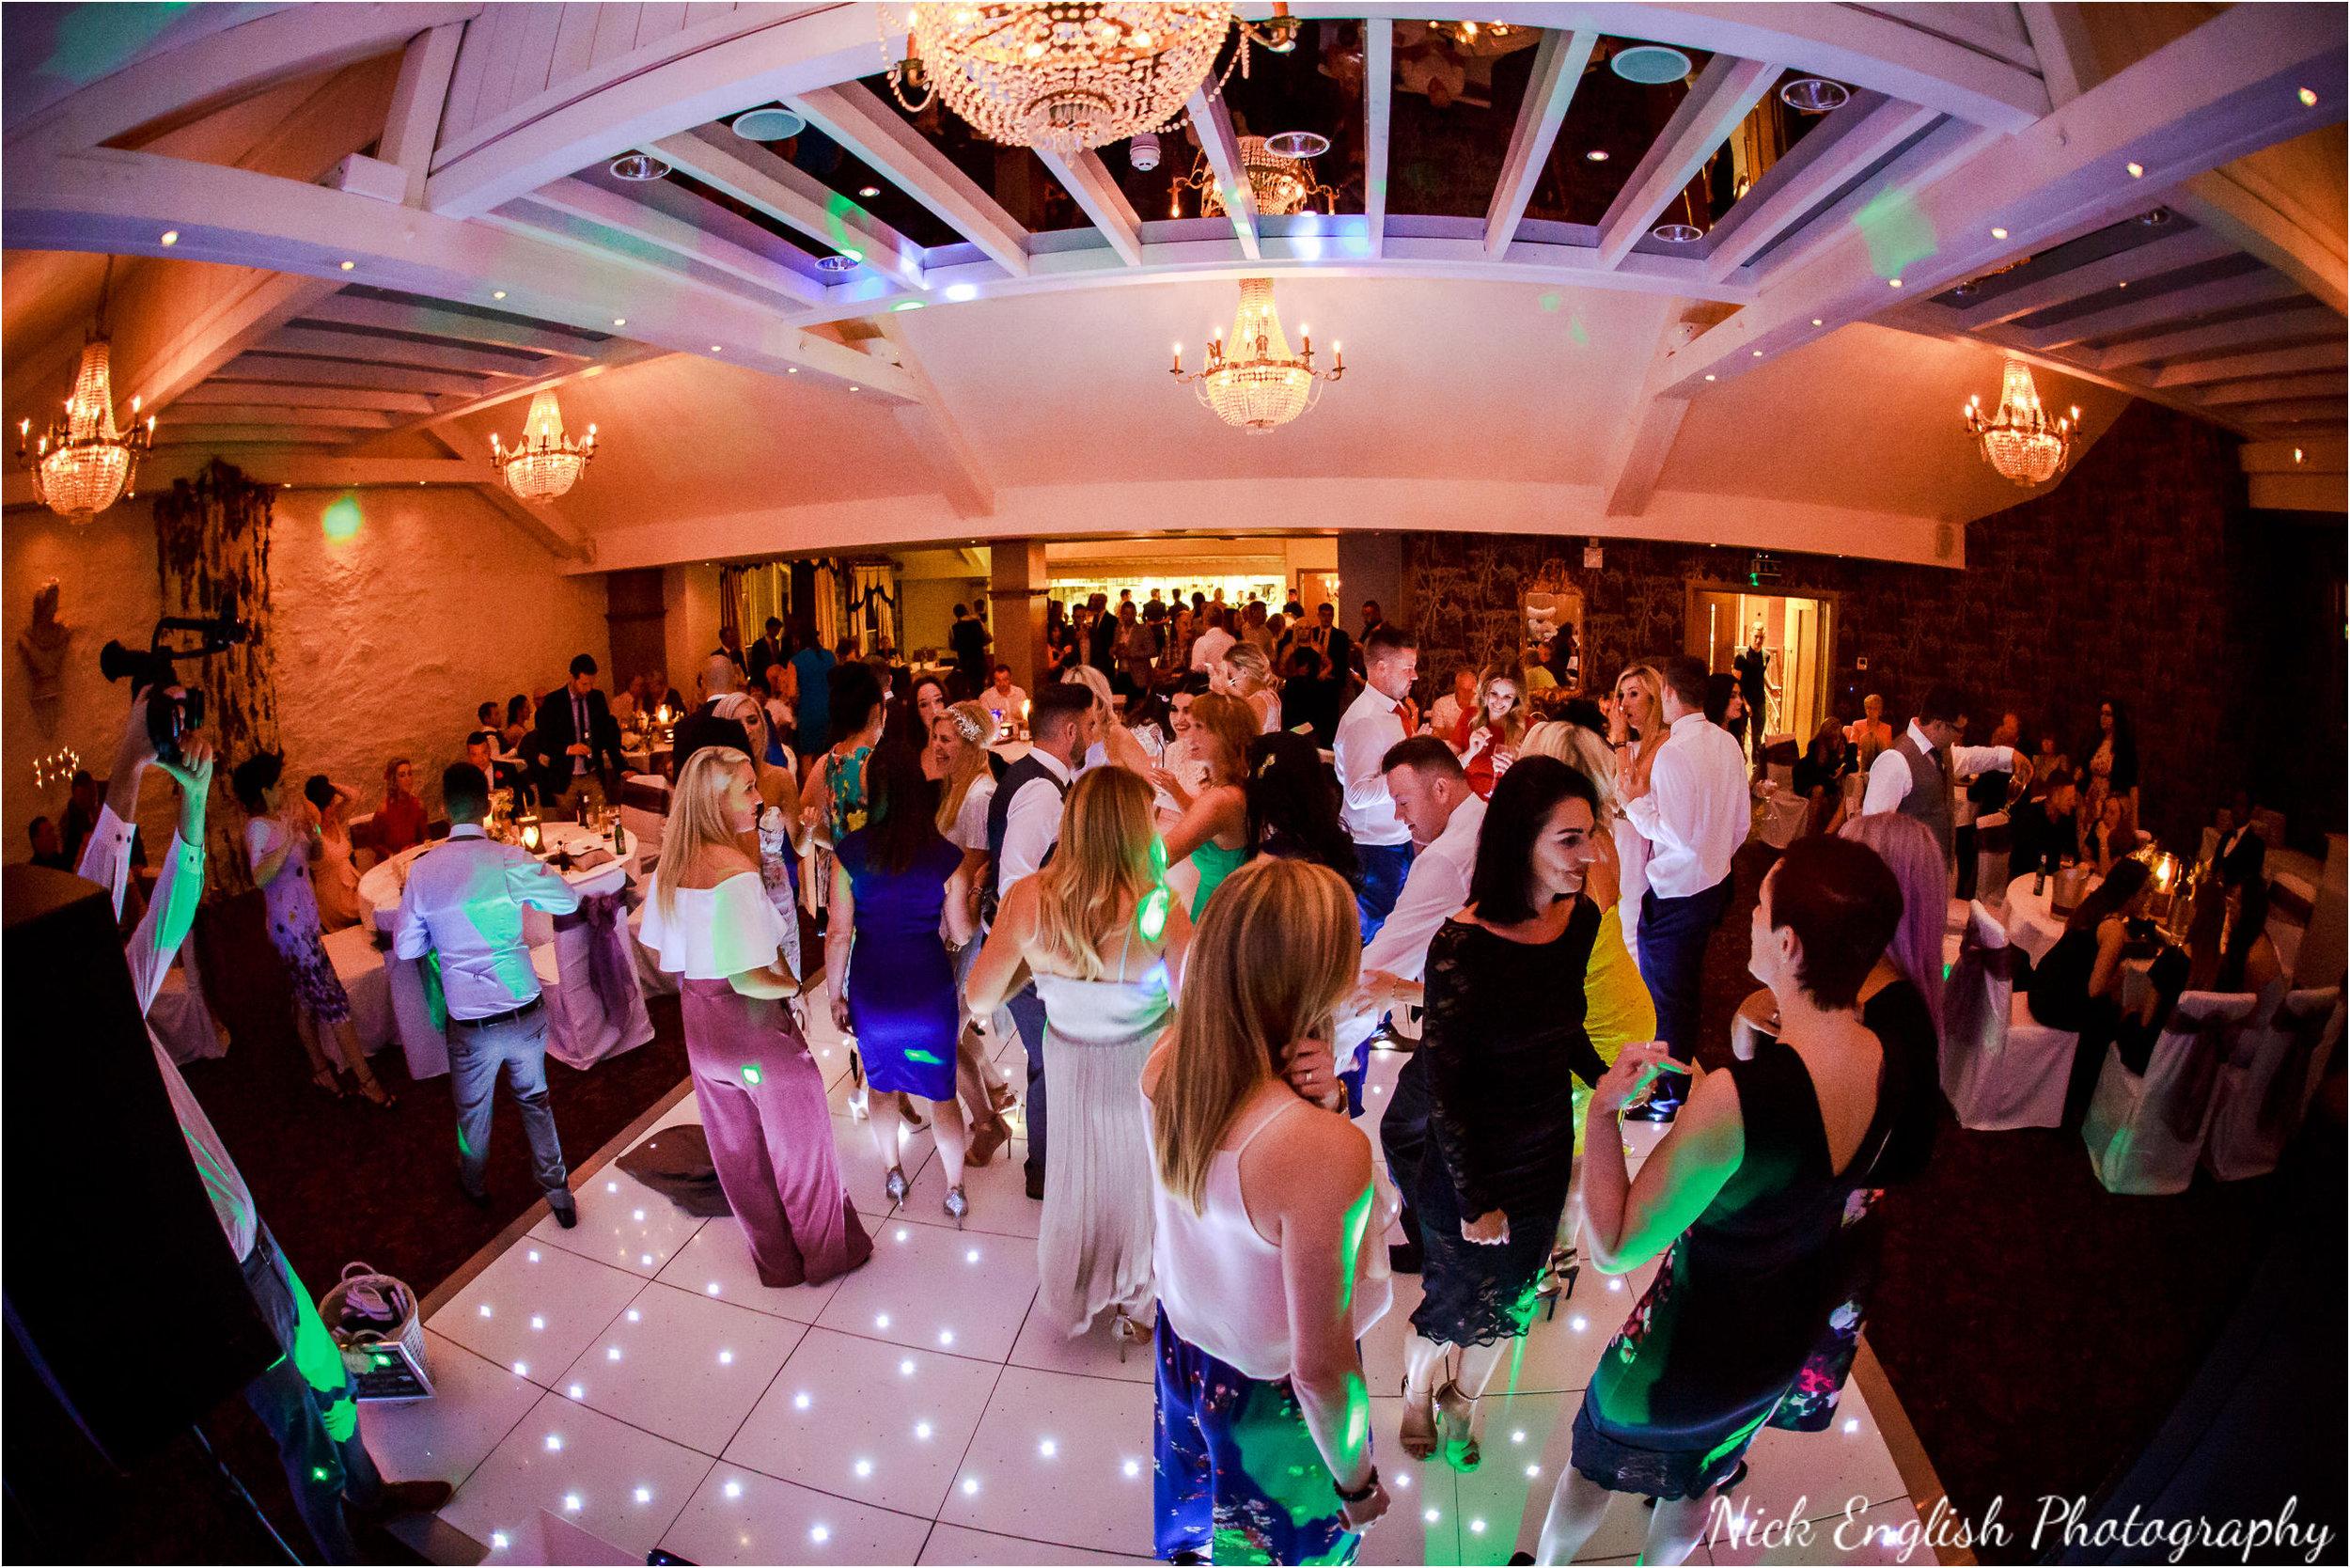 Stacey-Ash-Wedding-Photographs-Stanley-House-Preston-Lancashire-255.jpg